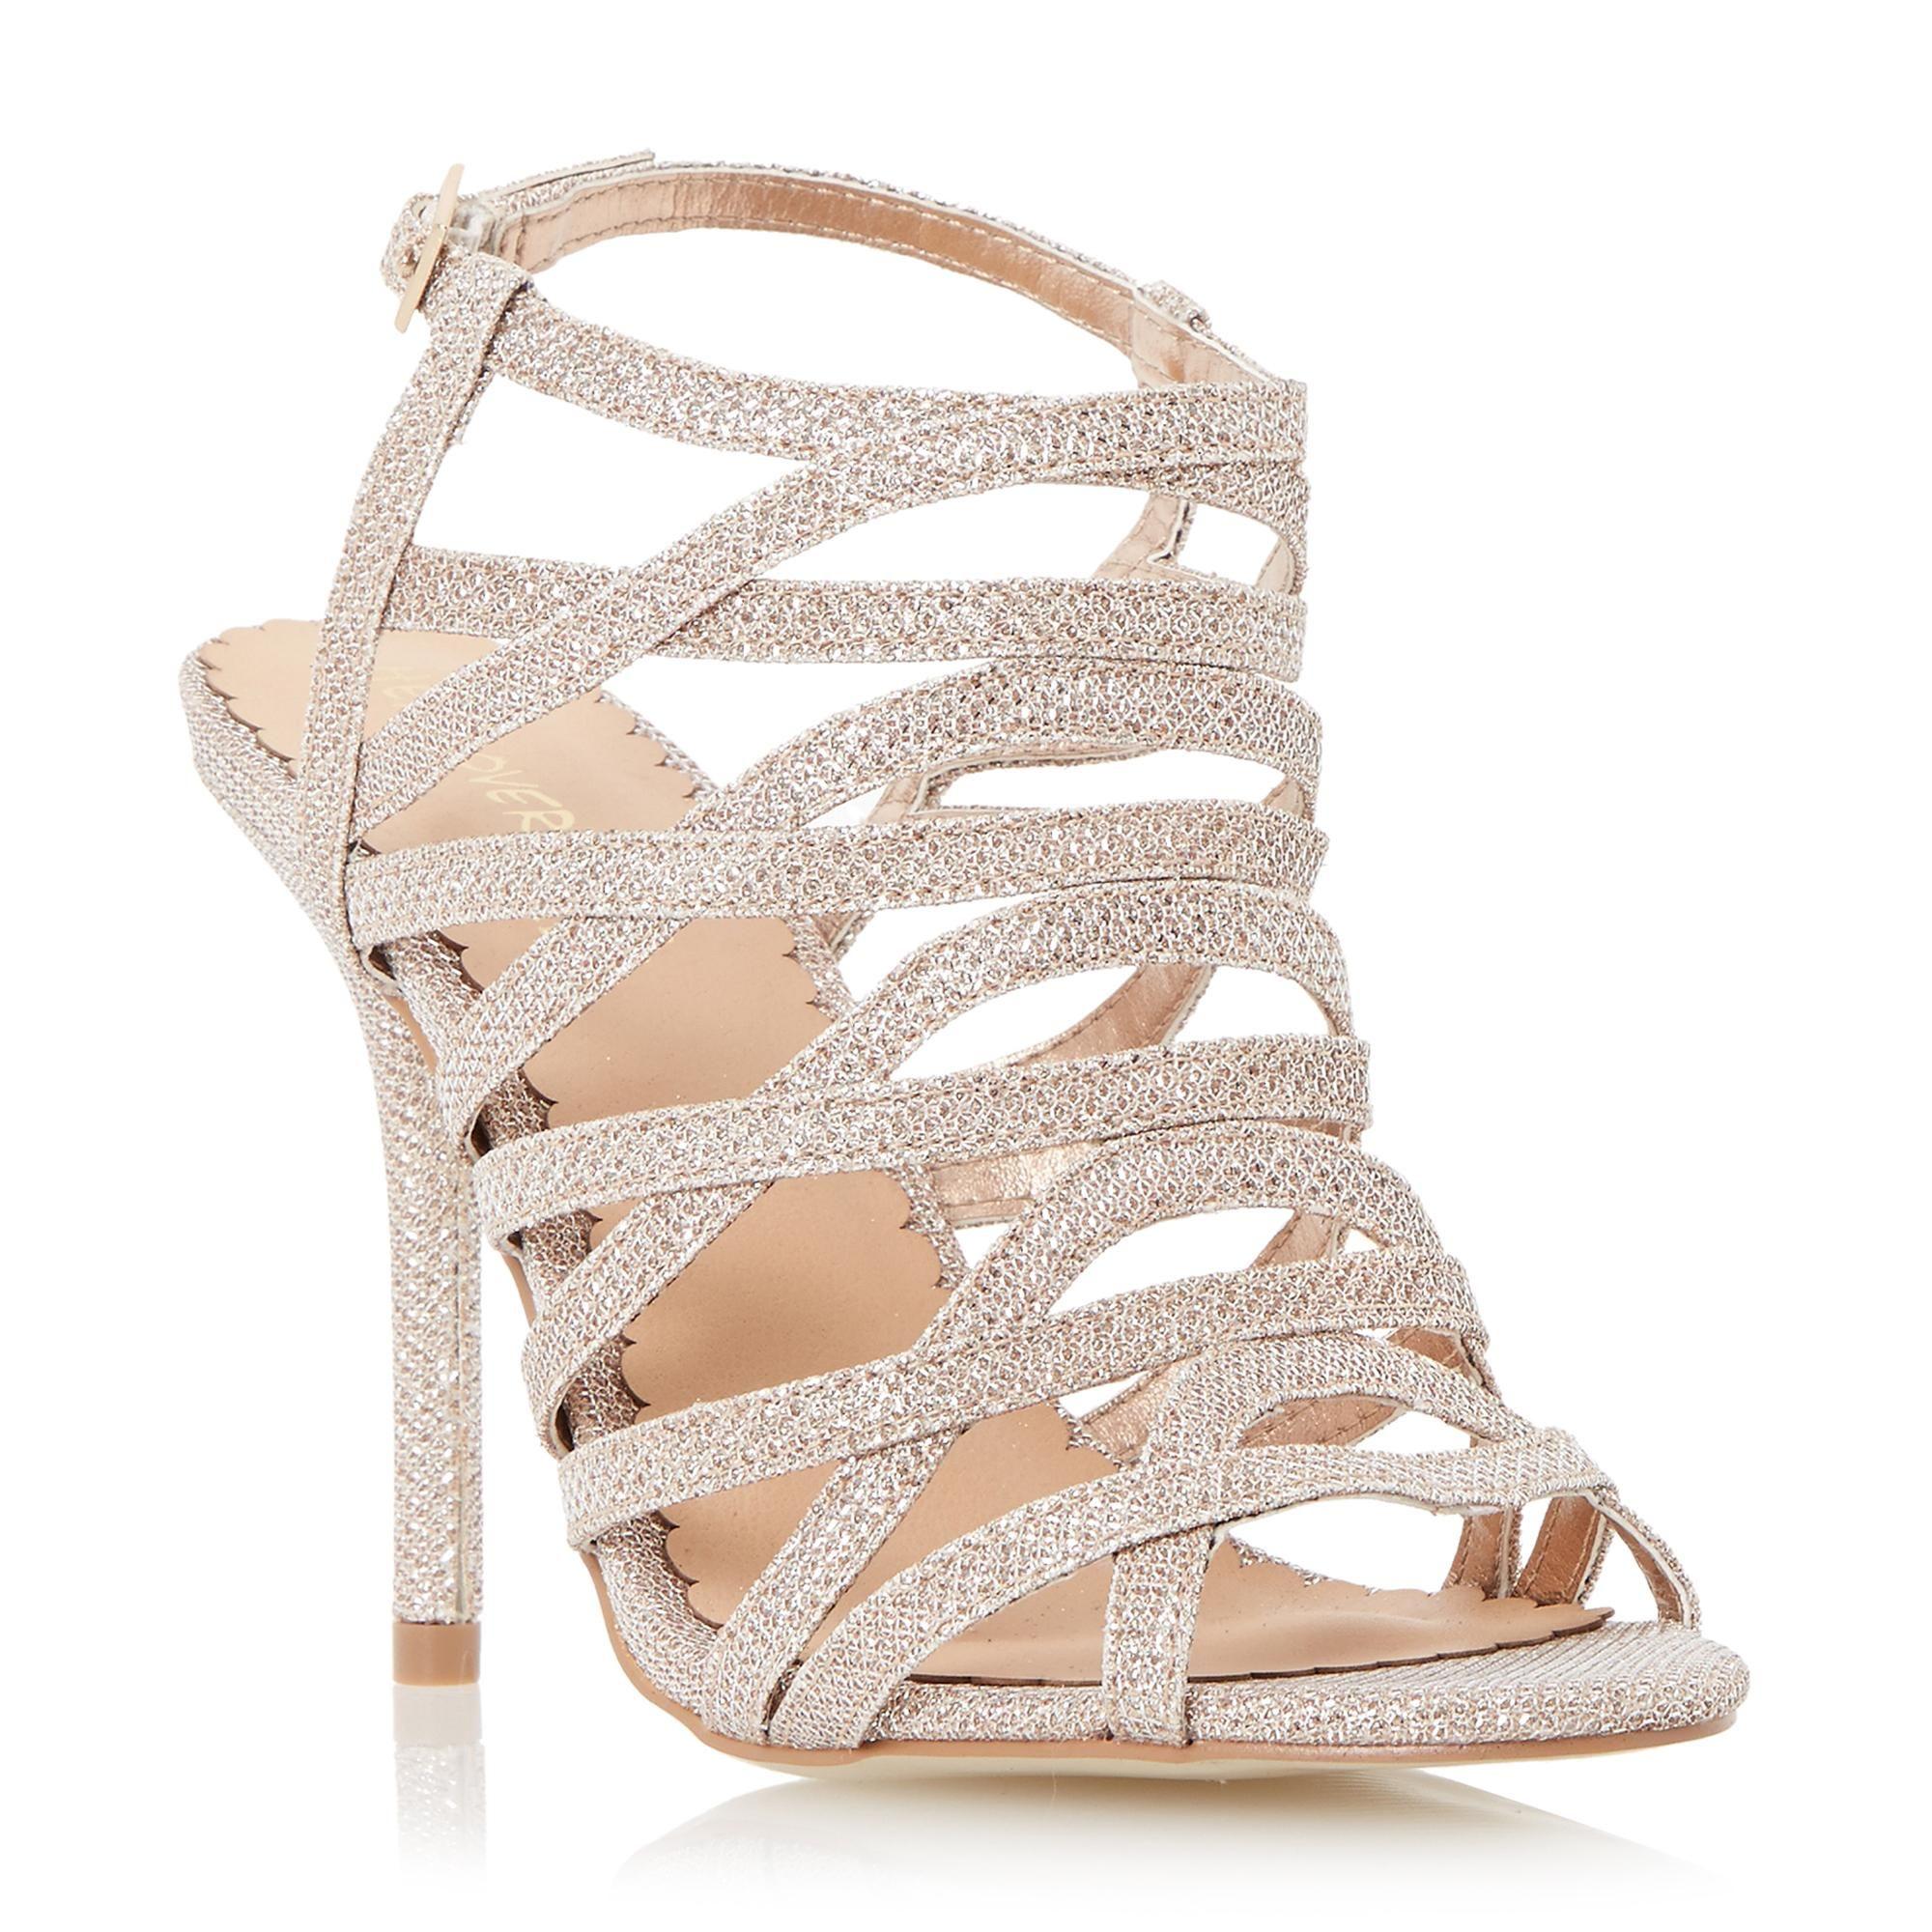 Head Over Heels by Dune Ladies MANARA Strappy High Heel Sandal in Gold Size  UK 8